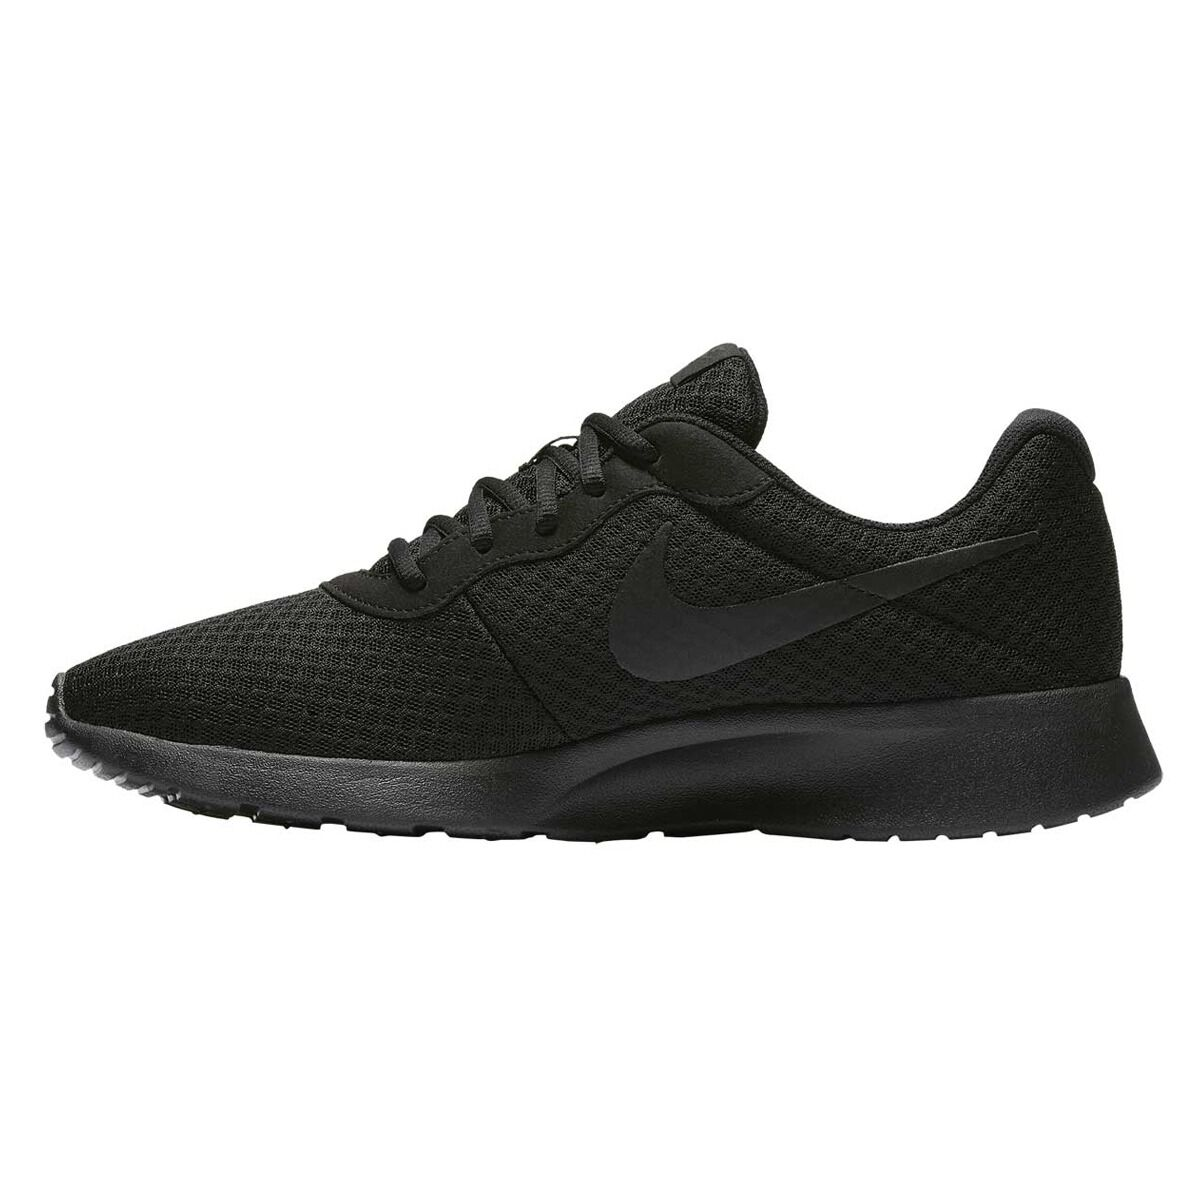 new styles 5dca2 144e8 ... promo code nike tanjun mens casual shoes black us 7 black rebelhi res  79b08 c3037